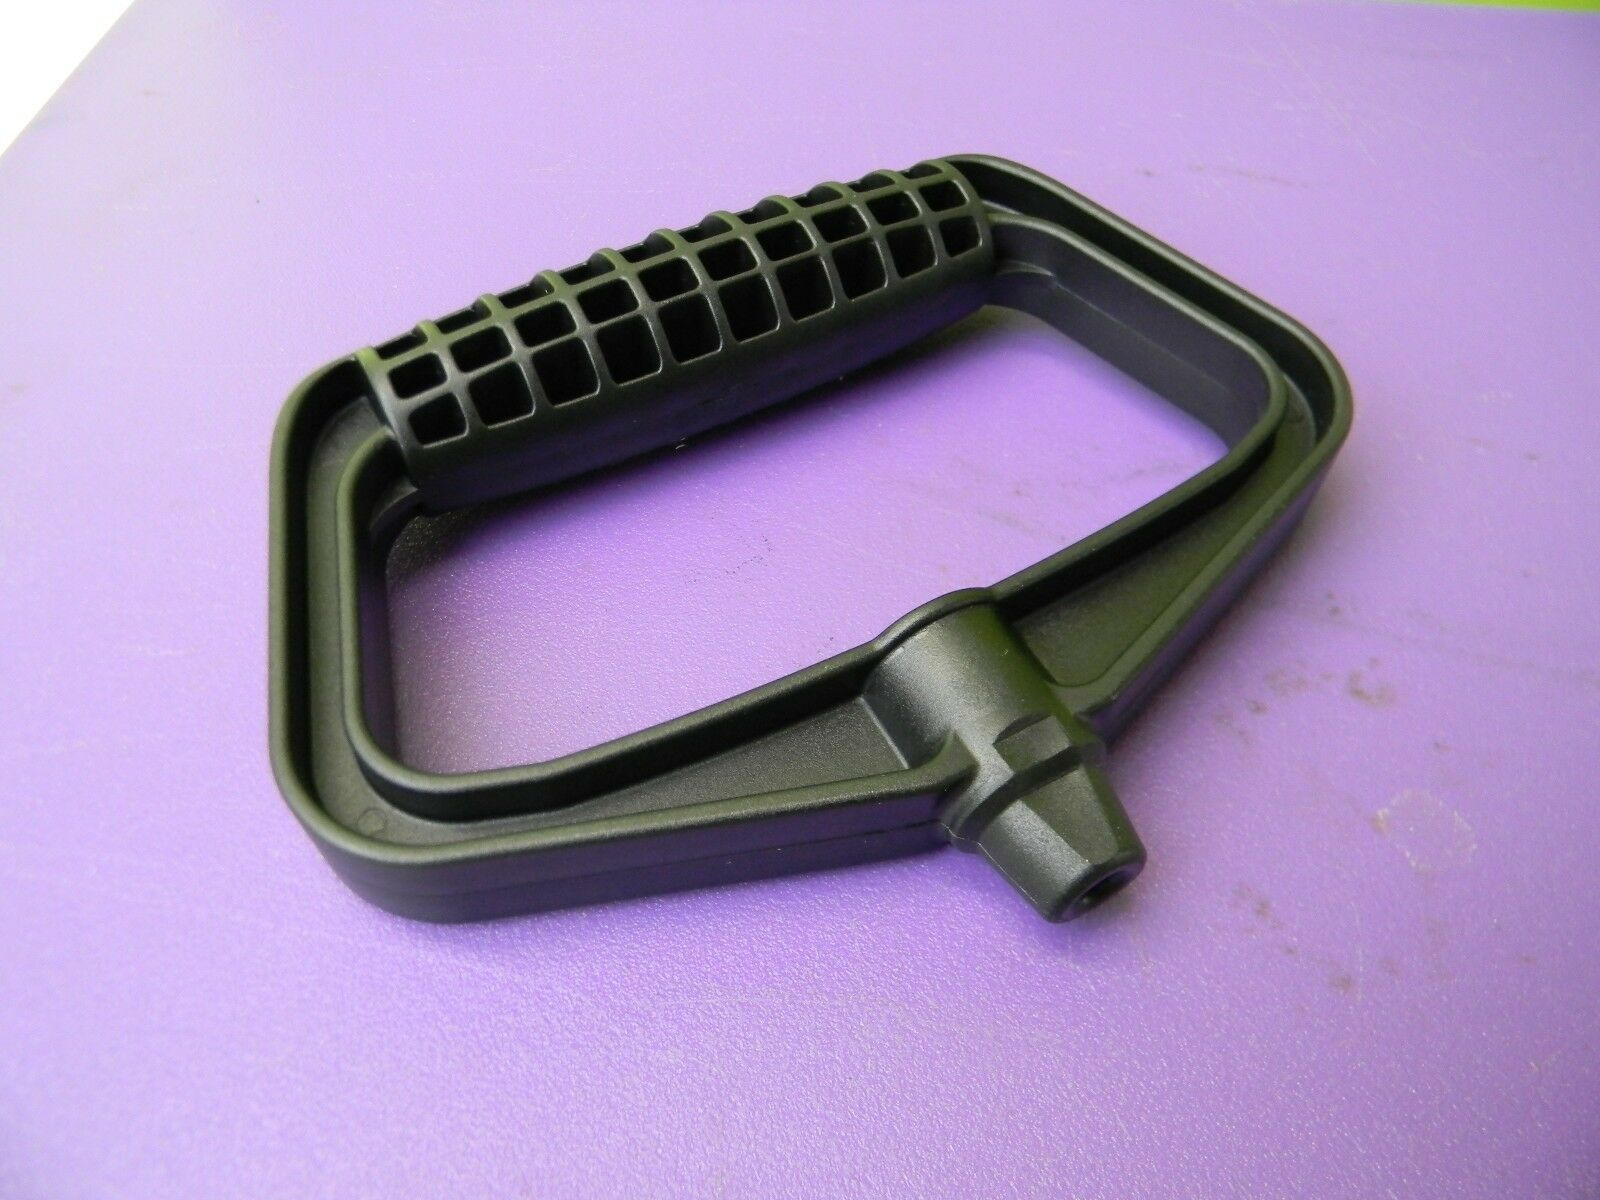 Genuine STIHL D-Handle Starter Grip 1128 195 3401 OEM Fits MS440 MS460 MS461